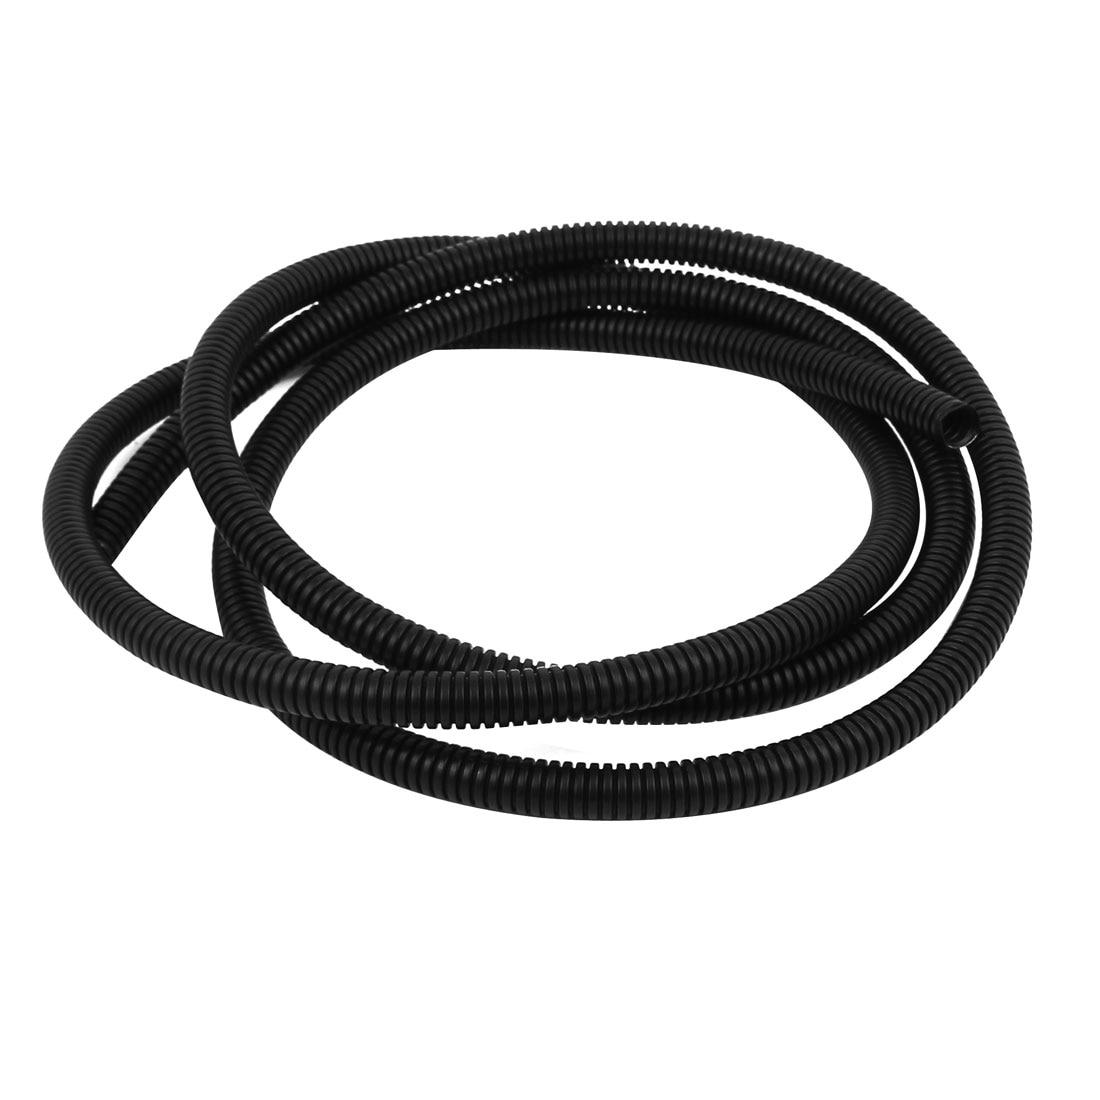 Cheap corrugated plastic drain pipe sizes find corrugated plastic - Uxcell Black Plastic 11 5mm X 8 5mm Flexible Corrugated Conduit Pipe Hose Tube 2m Long